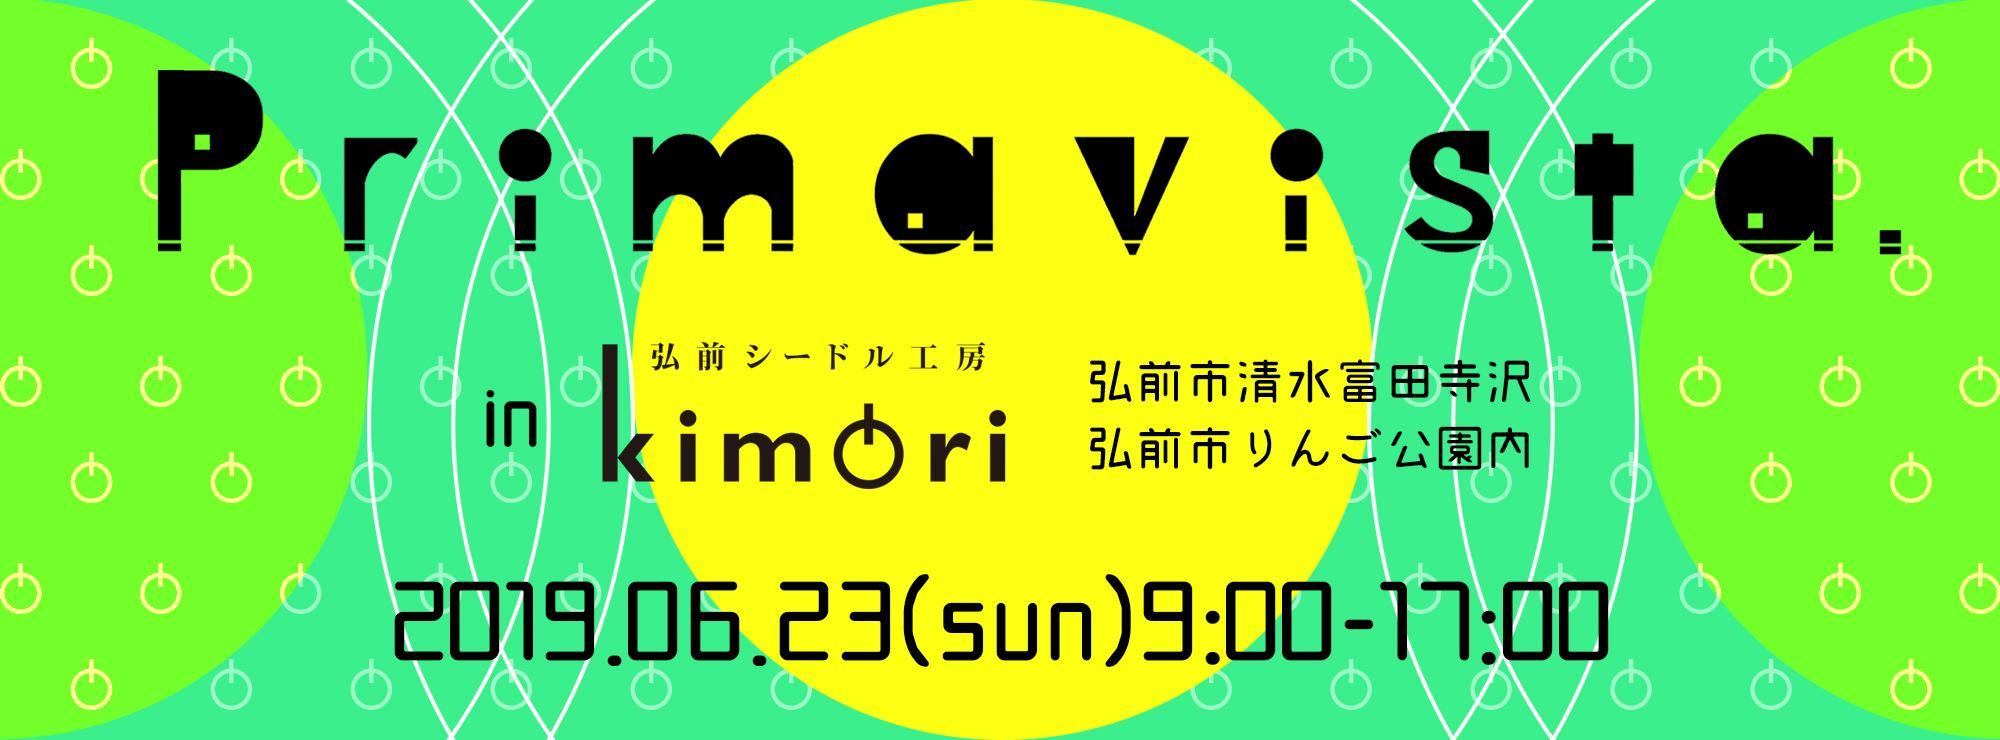 Primavista in 弘前シードル工房kimoriを6月23日に開催します